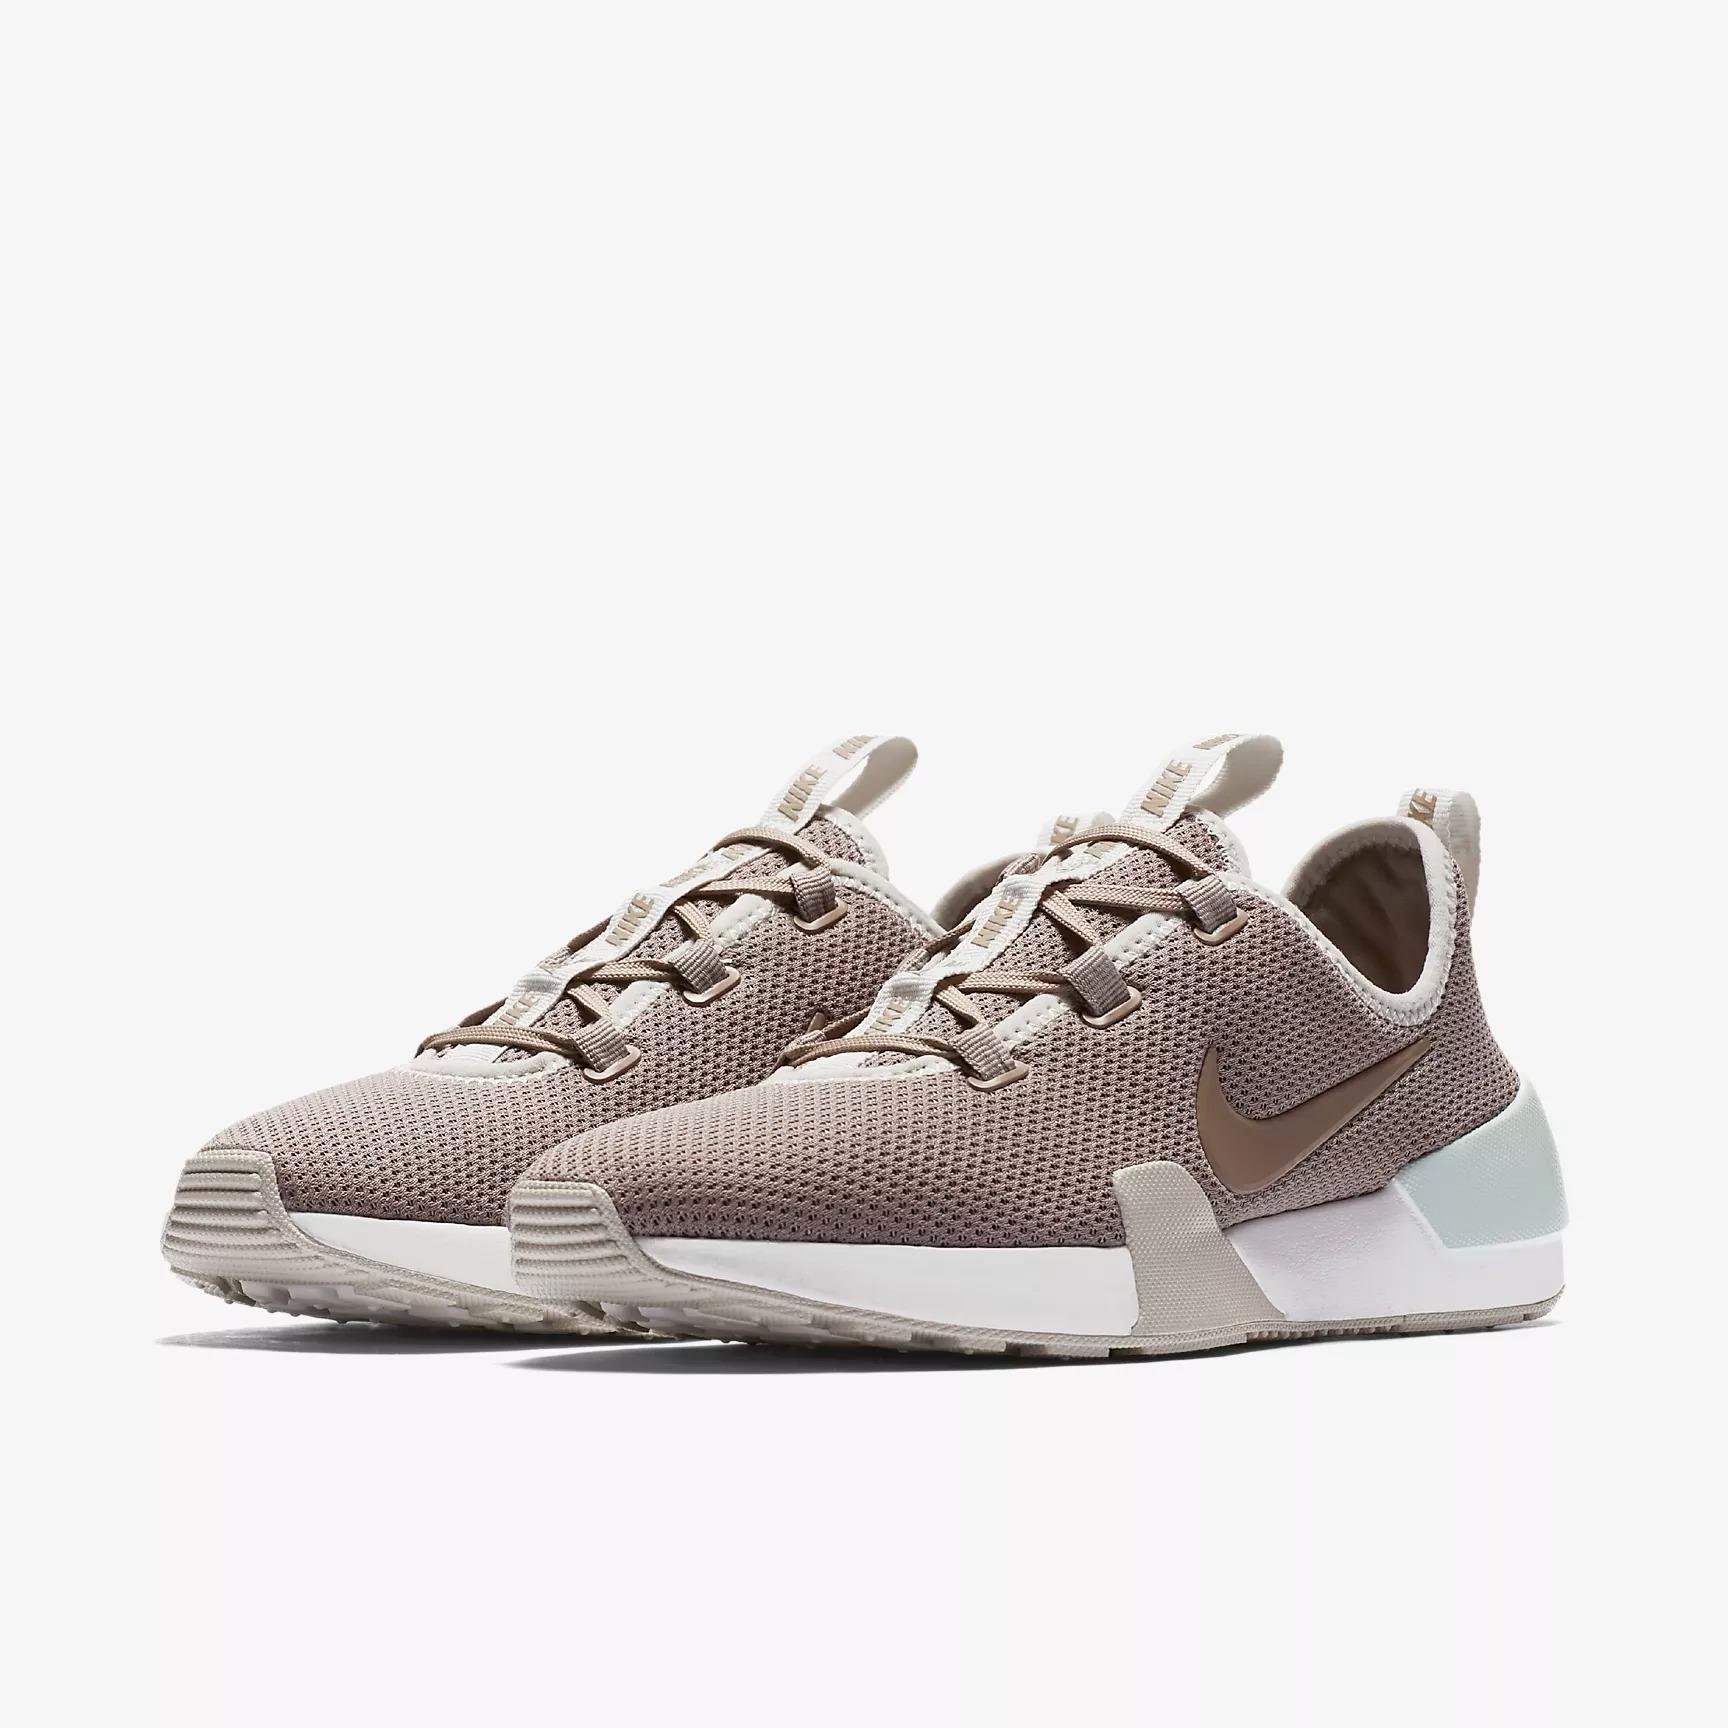 outlet store c61c4 d8946 Nike Wmns Ashin Modern Run - SPORT SHOES Lifestyle Shoes  Sneakers -  Superfanas.lt